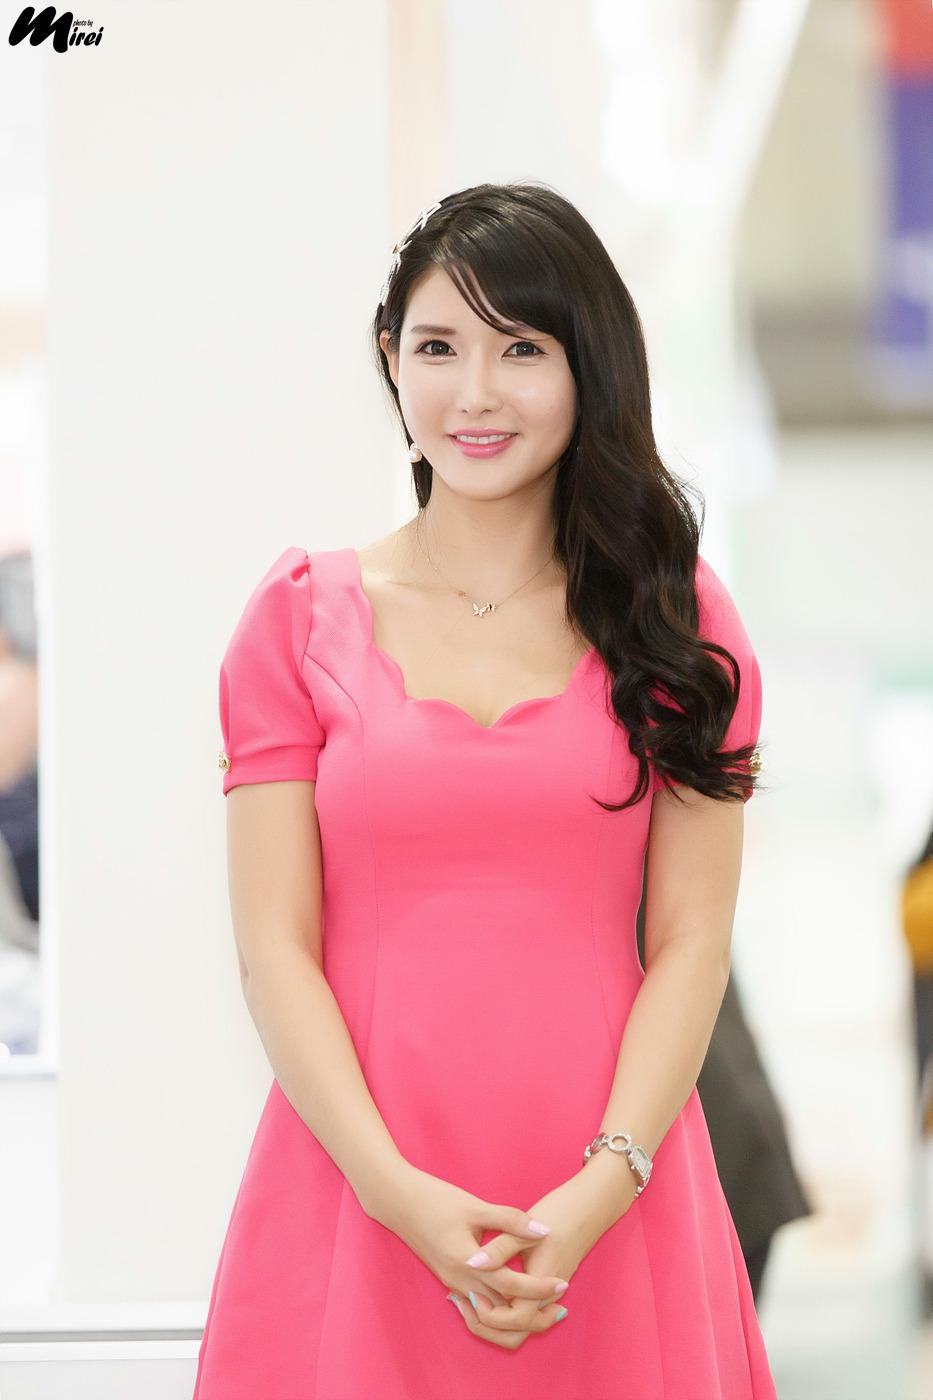 xxx nude girls: Cha Sun Hwa - Hot Red